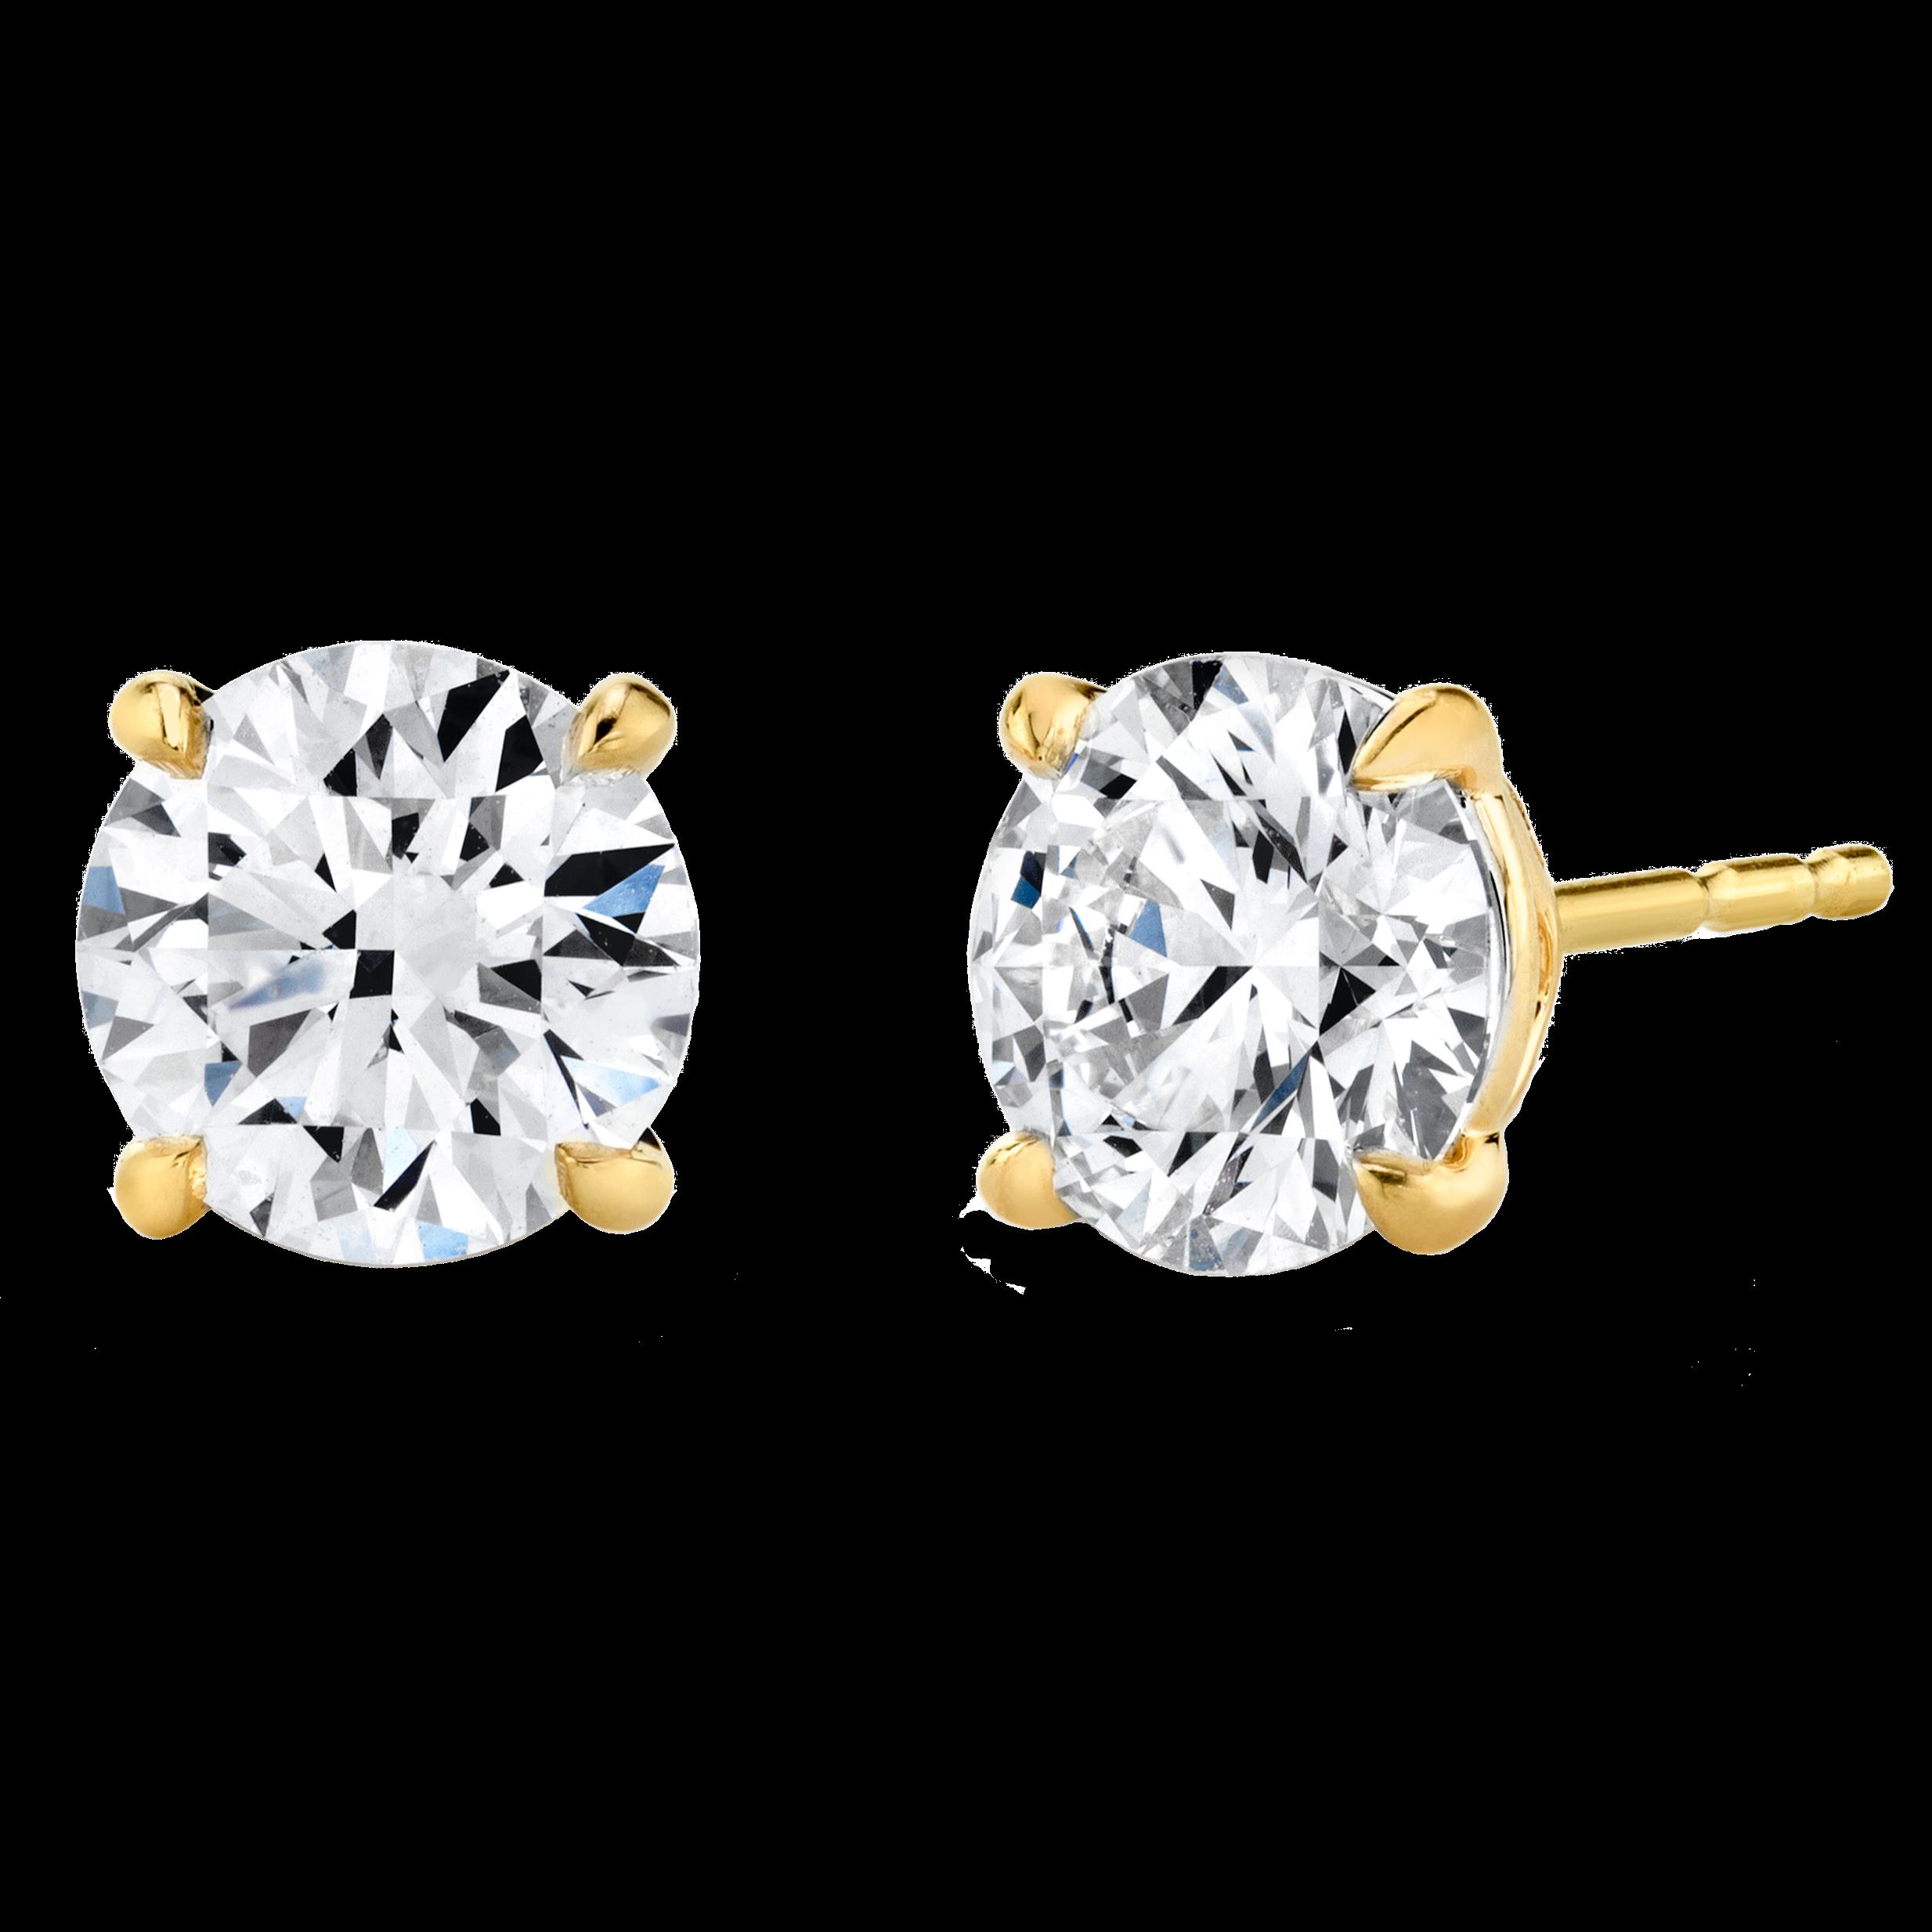 Solitaire Round Brilliant Diamond Studs